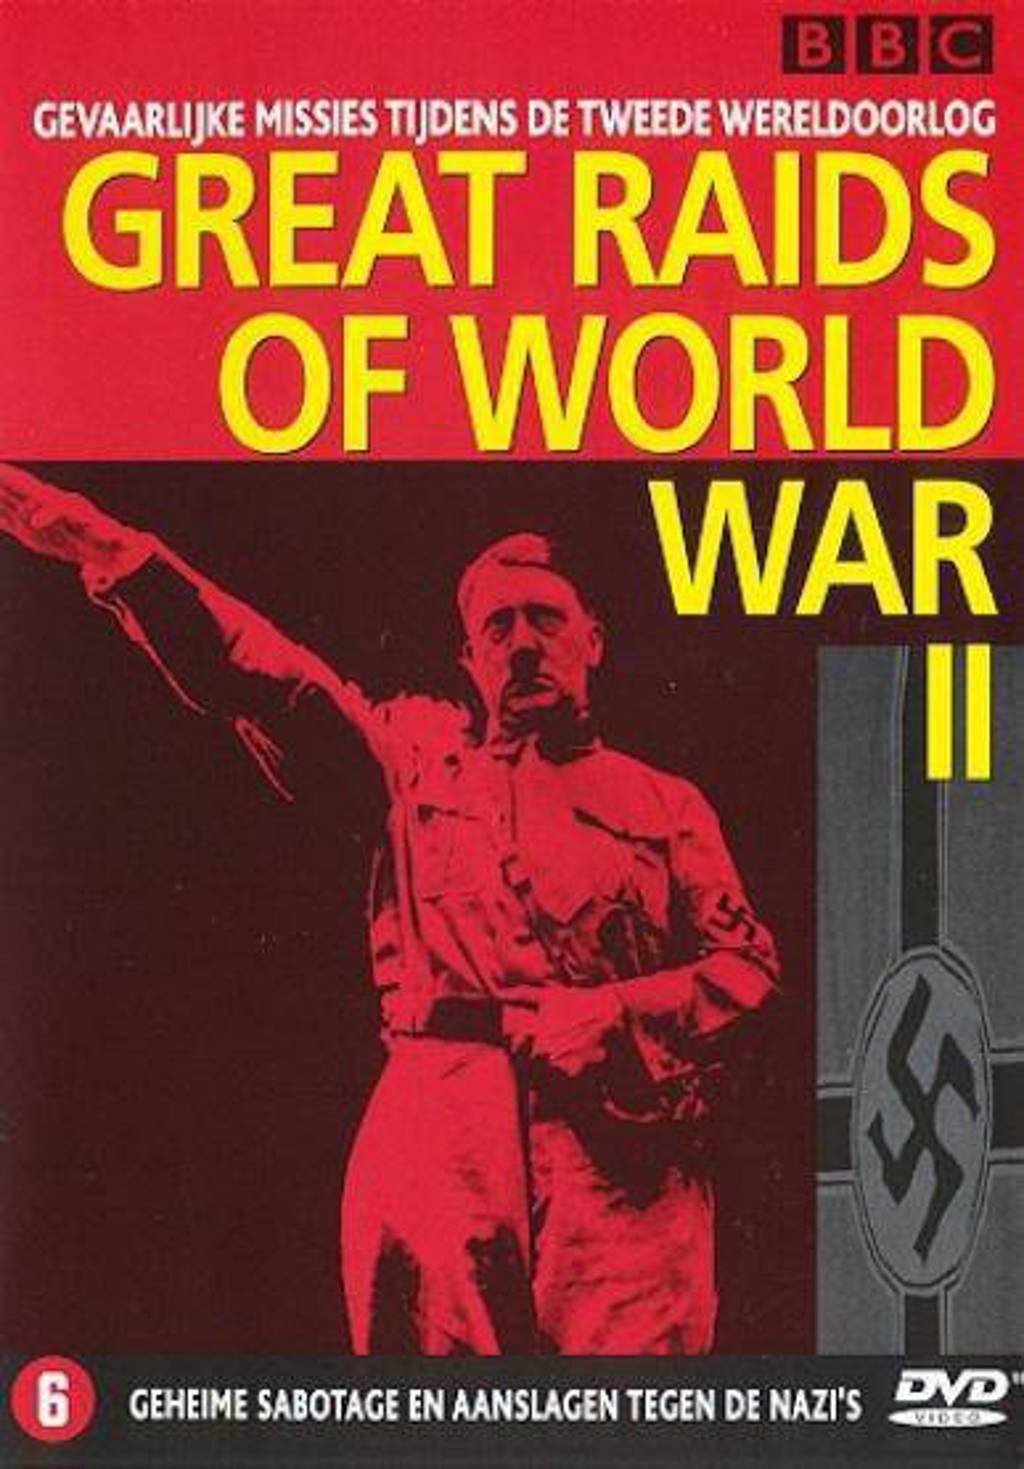 Great raids of world war II (DVD)